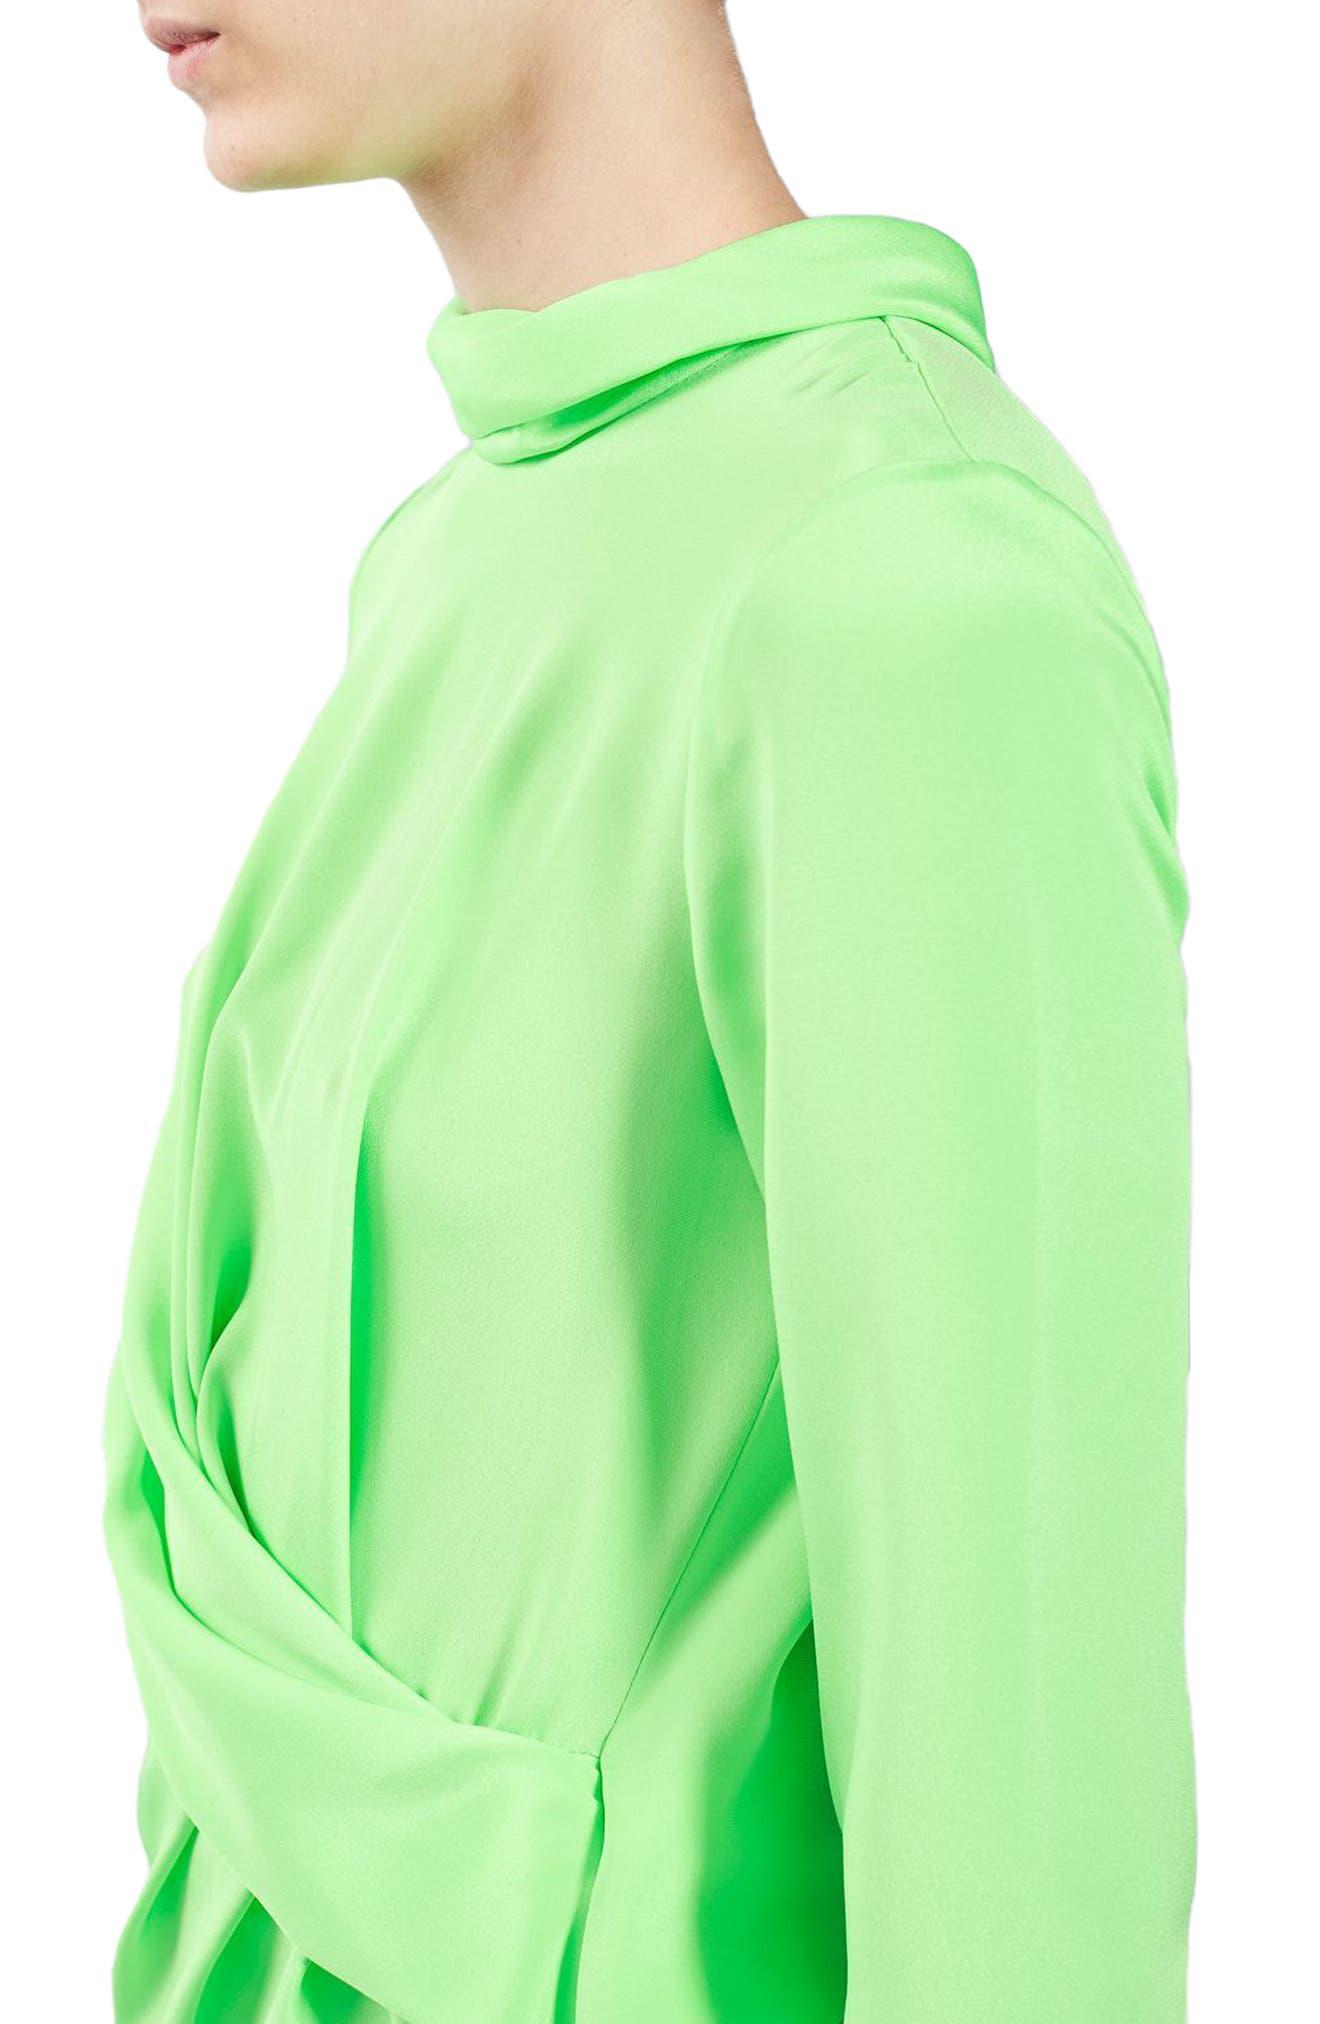 Twist Cutout Silk Top,                             Alternate thumbnail 3, color,                             Bright Green